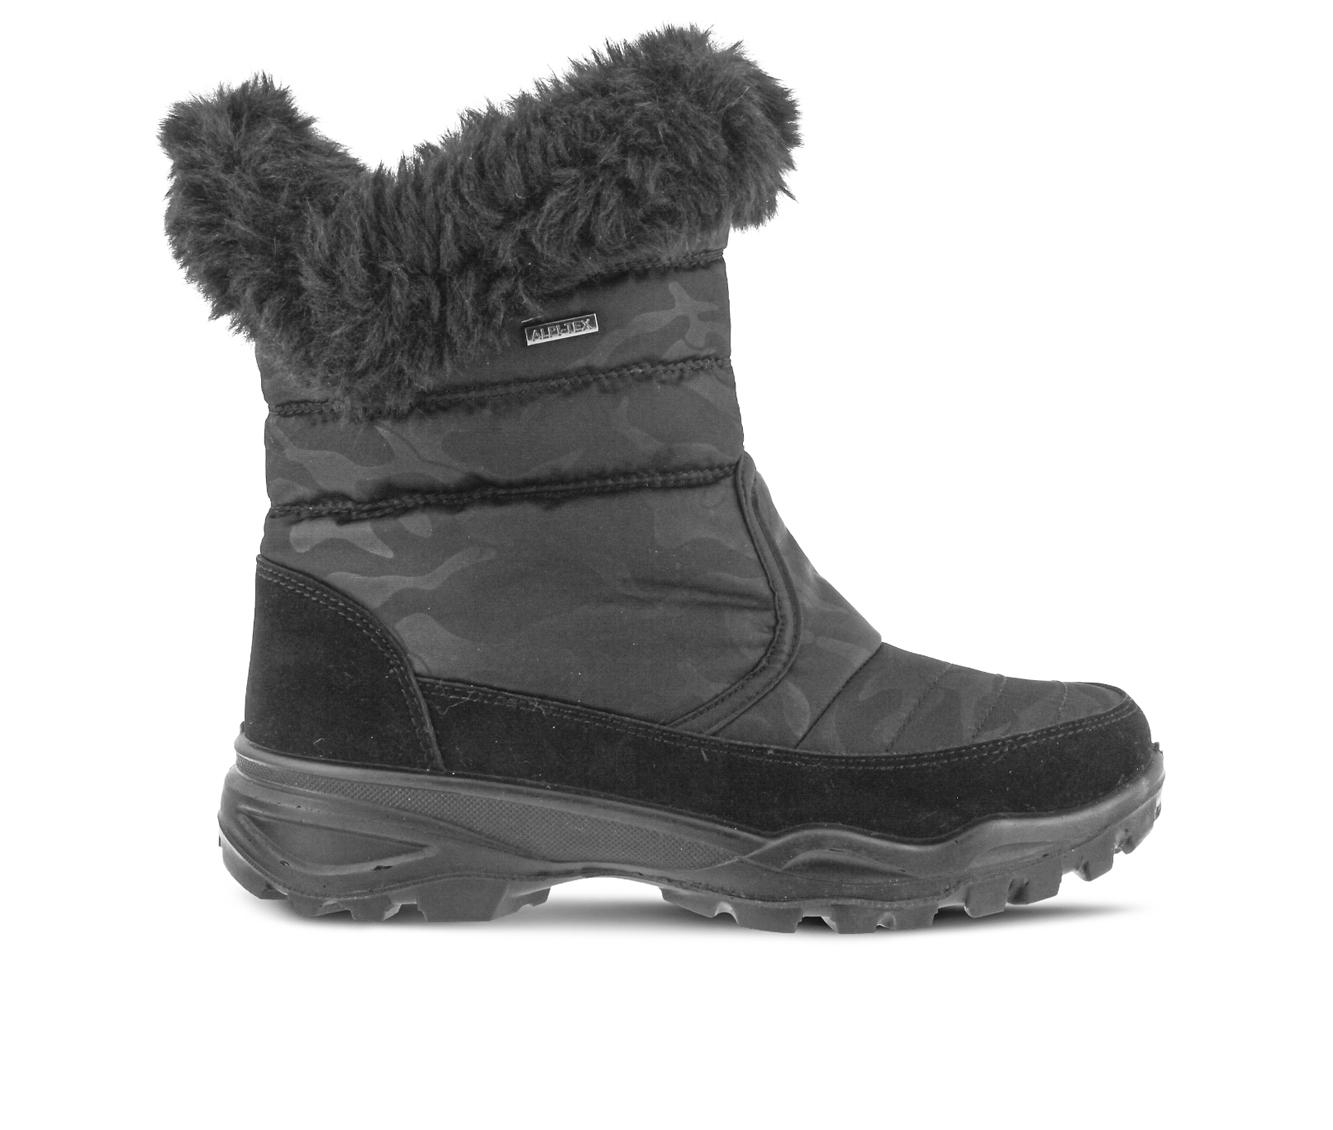 Flexus Korine Women's Boots (Black Canvas)